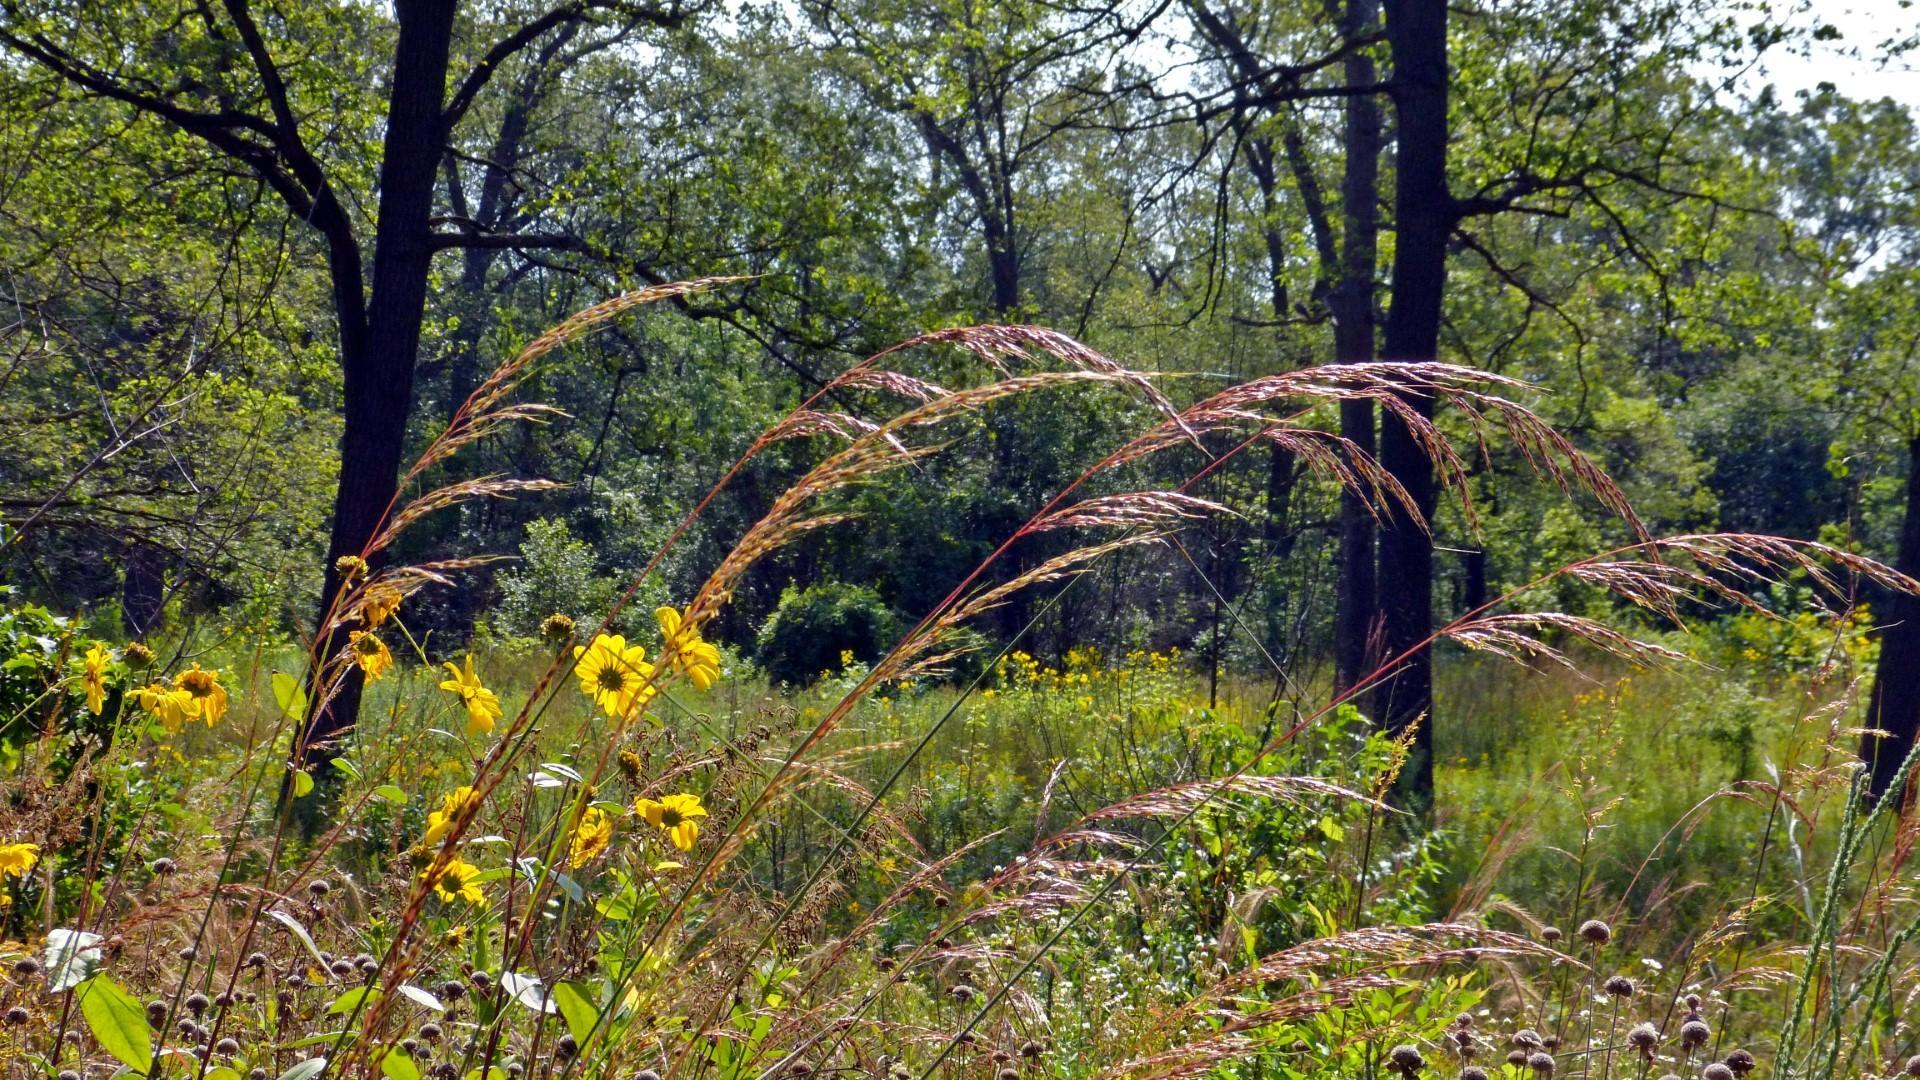 Indian Grass in the Black Oak Savannah. Photo: Karen Yukich